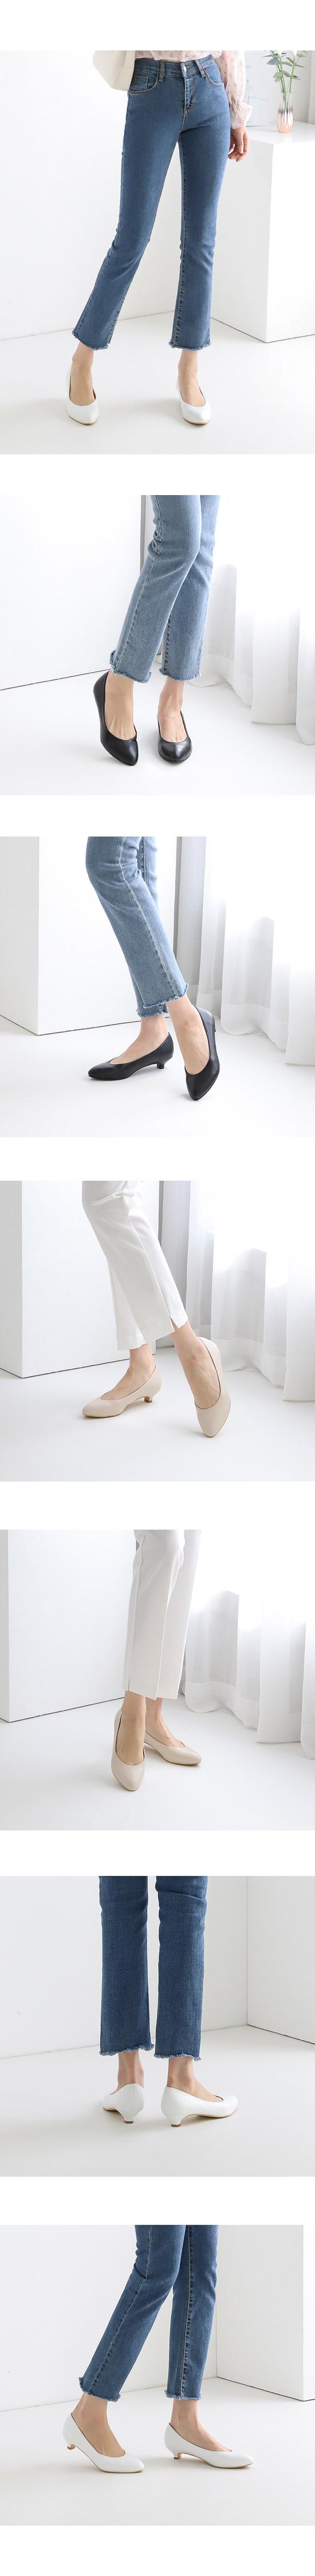 Simple Line Low Heel Pumps 3cm Black